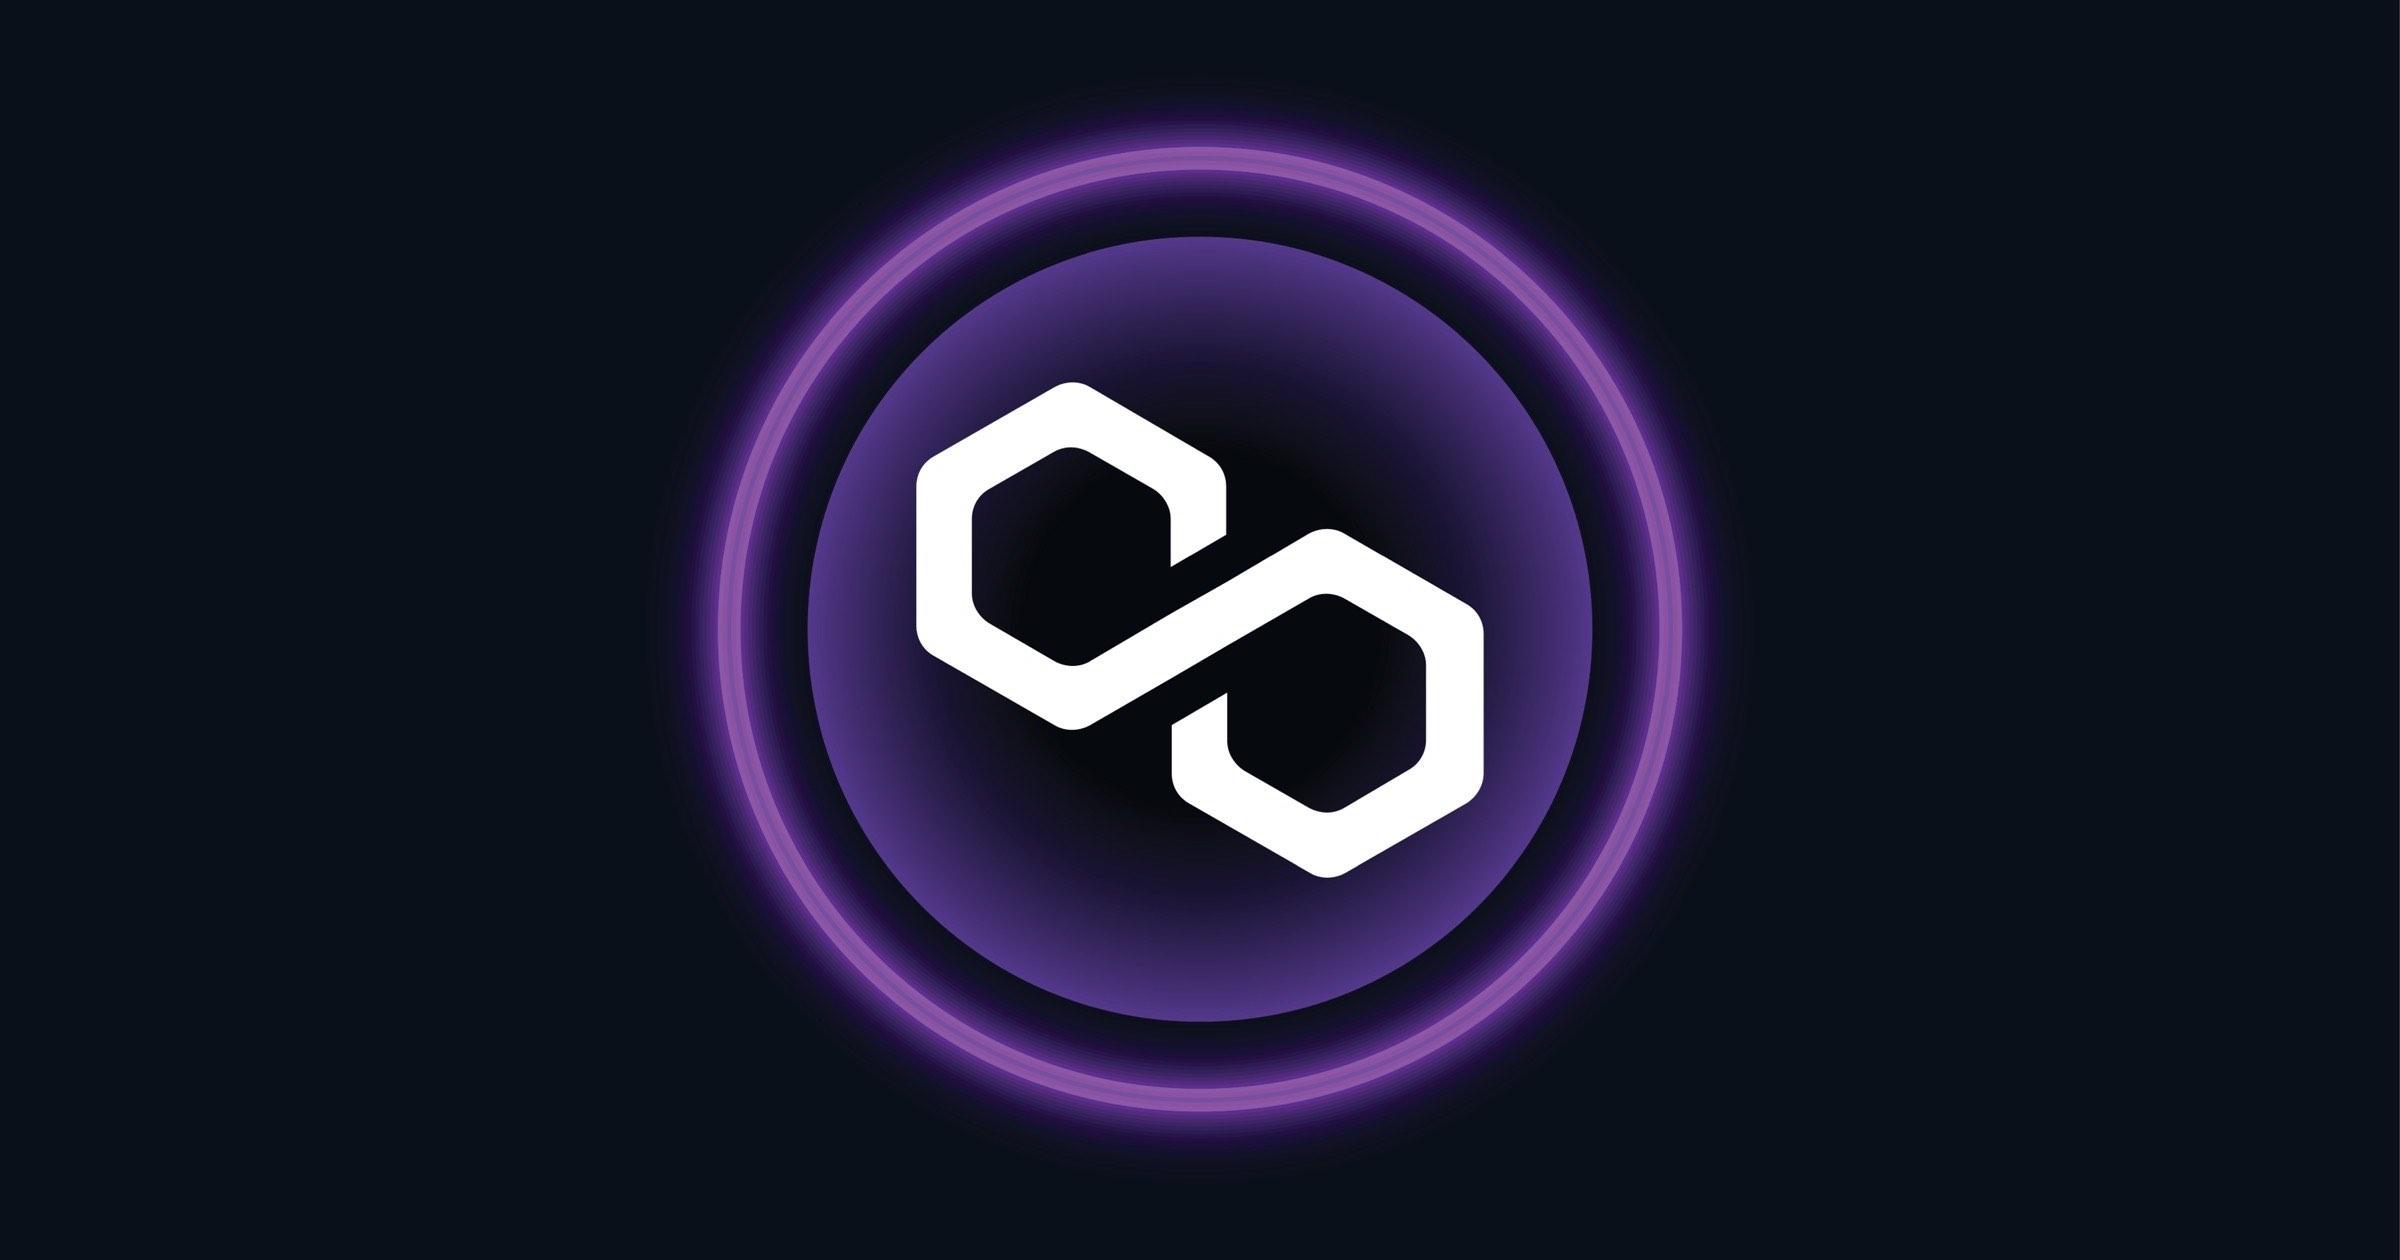 Polygon blockchain icon